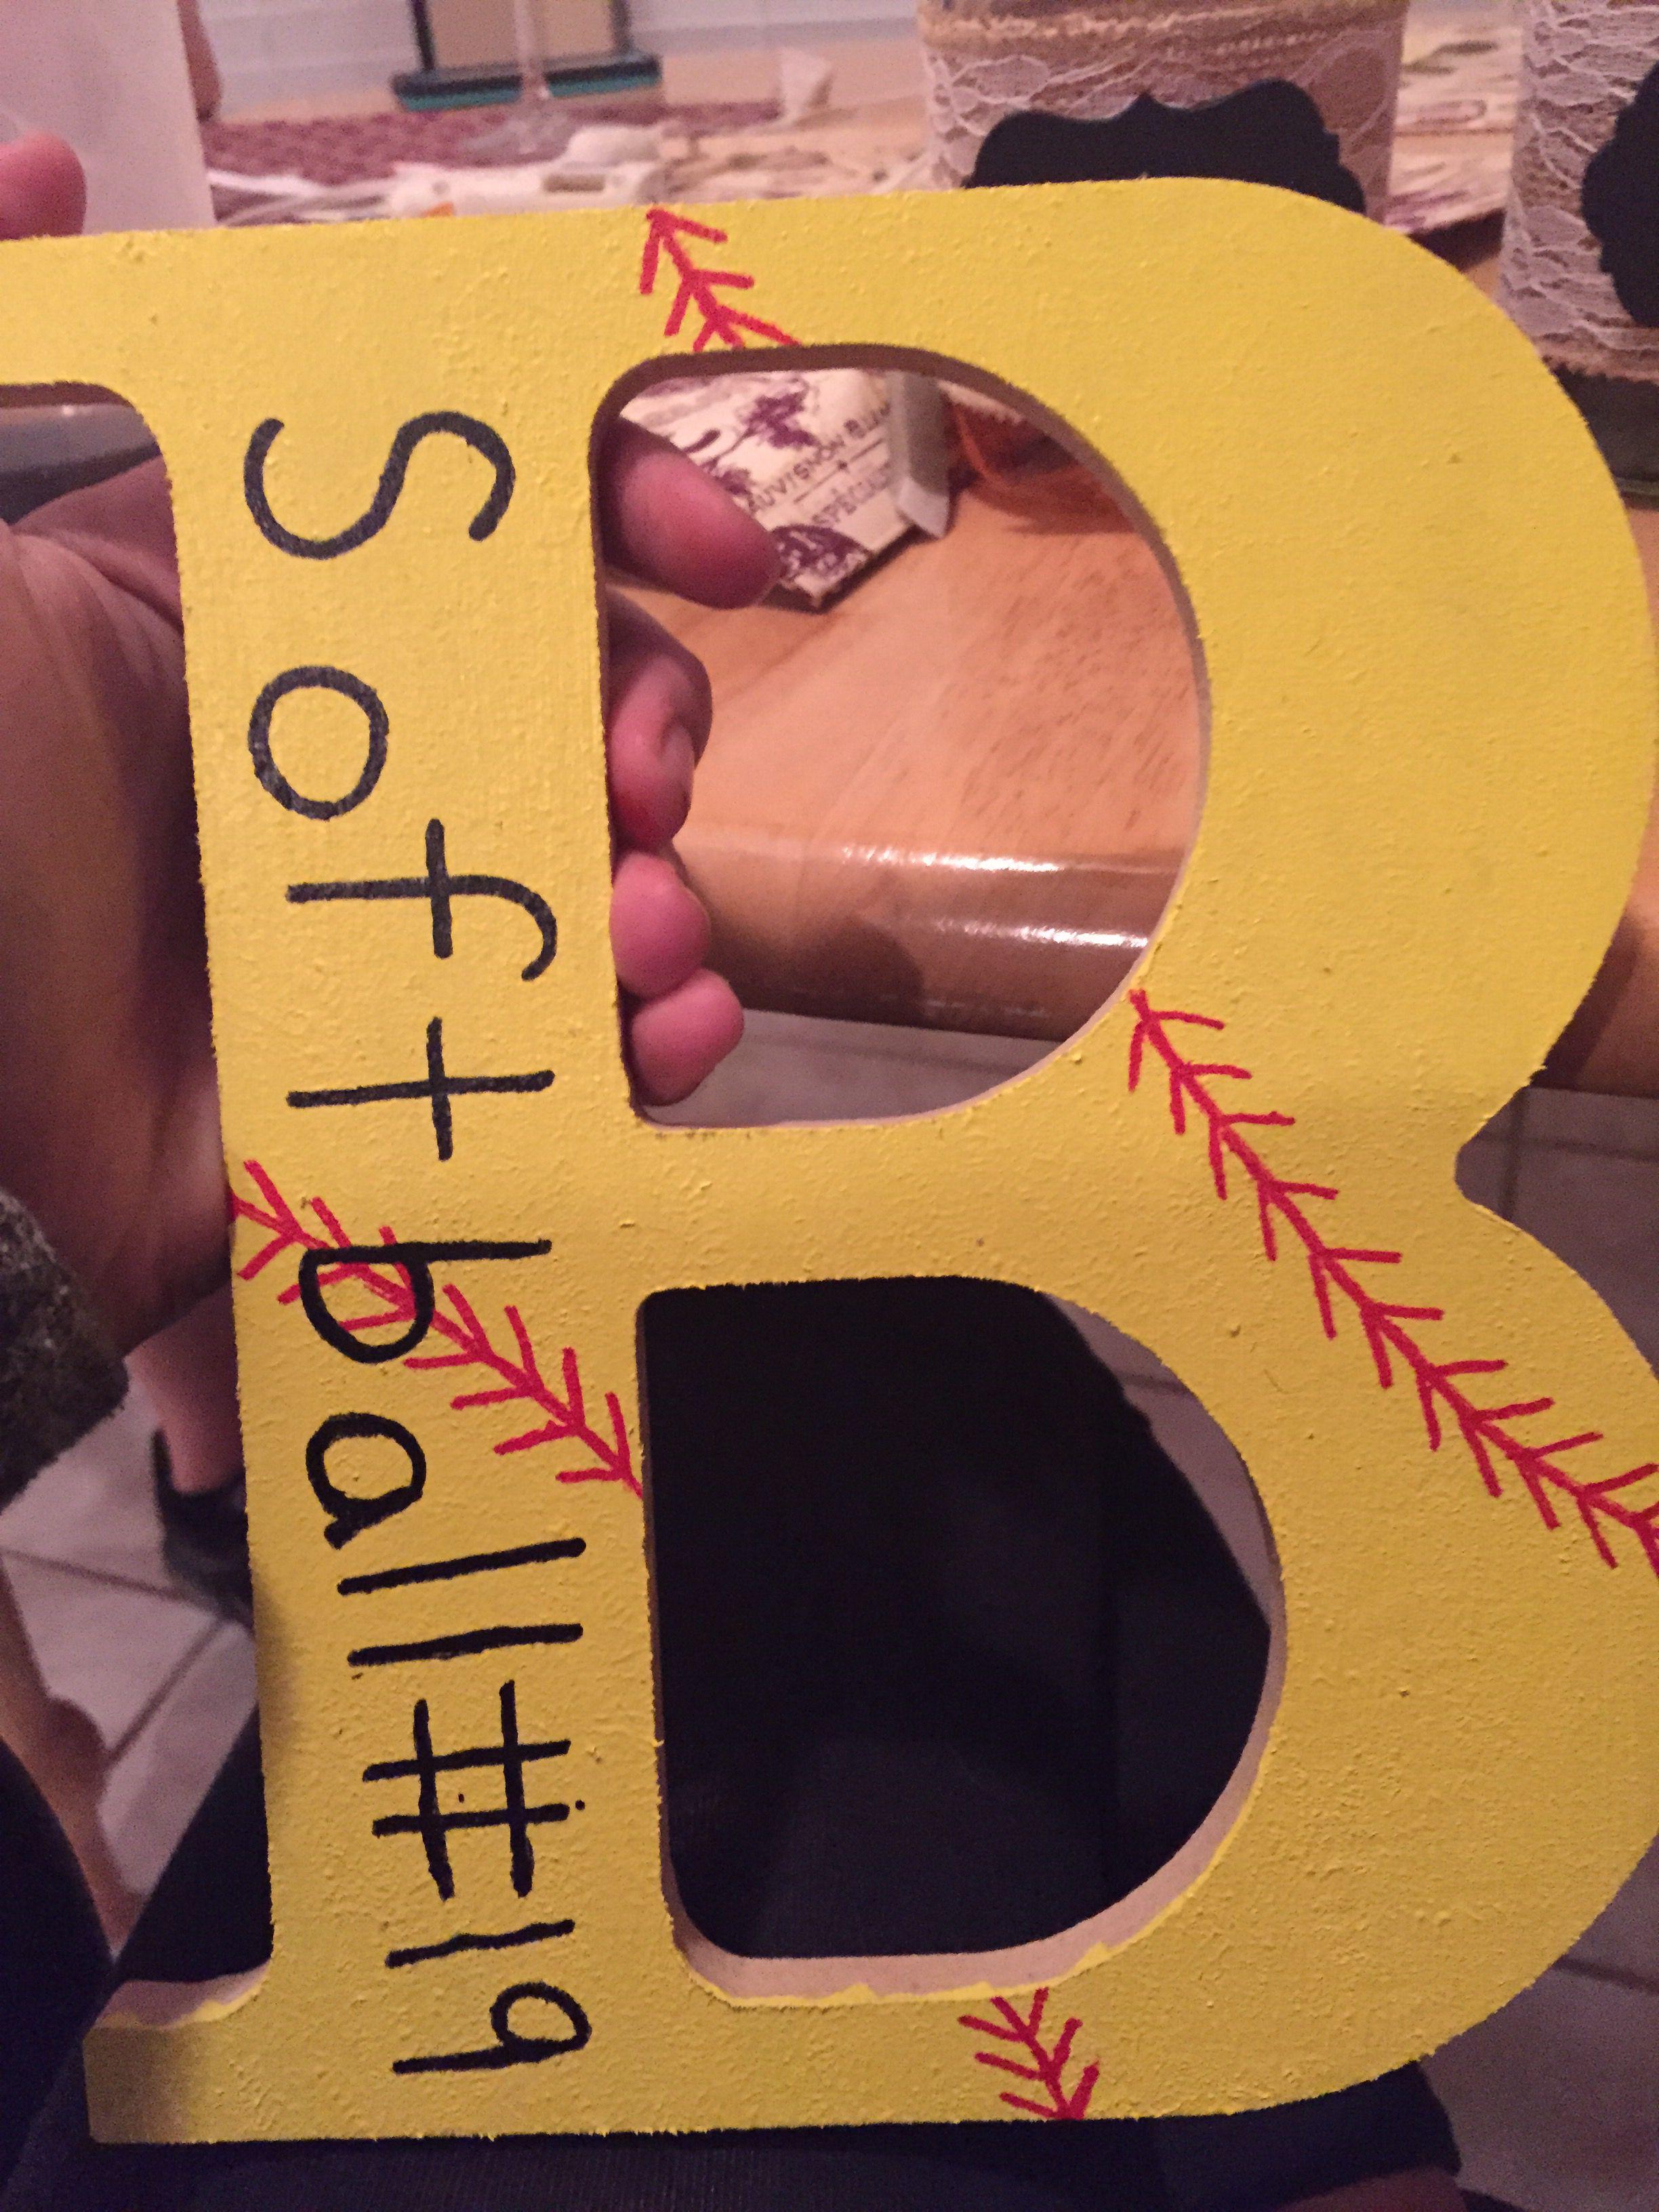 Easy diy softball crafts